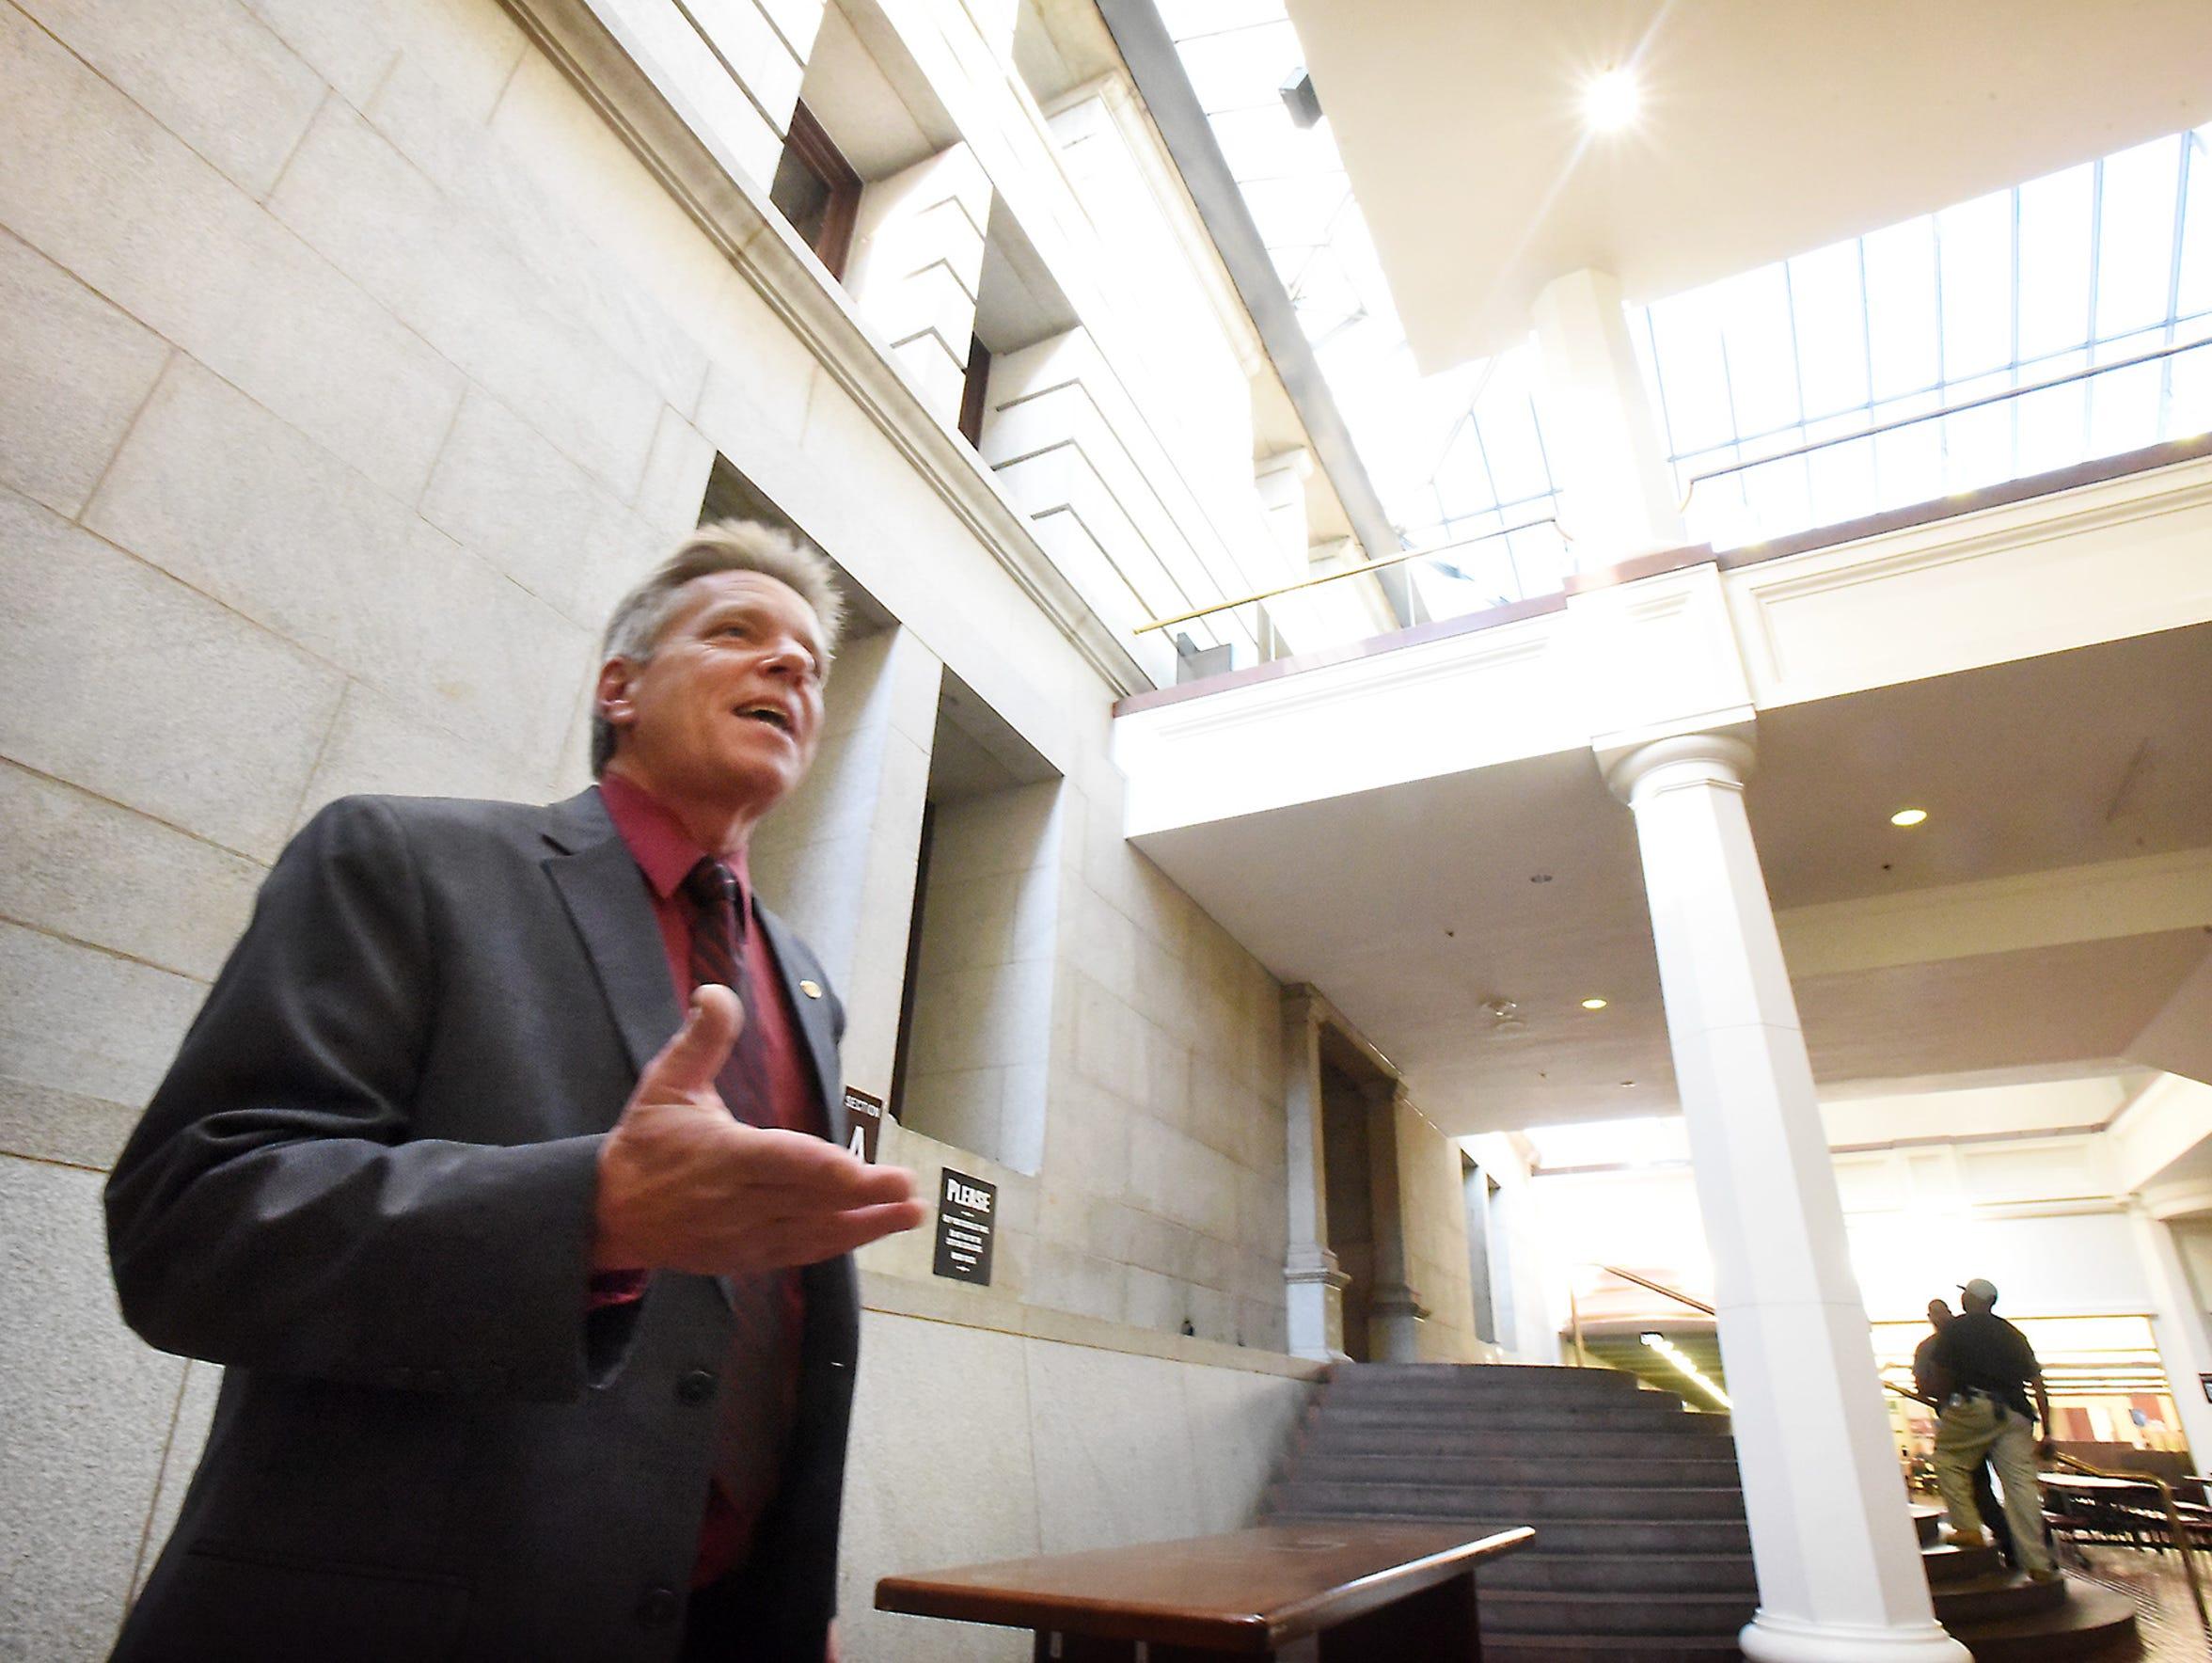 Pennsylvania State Representative Russ Diamond serves